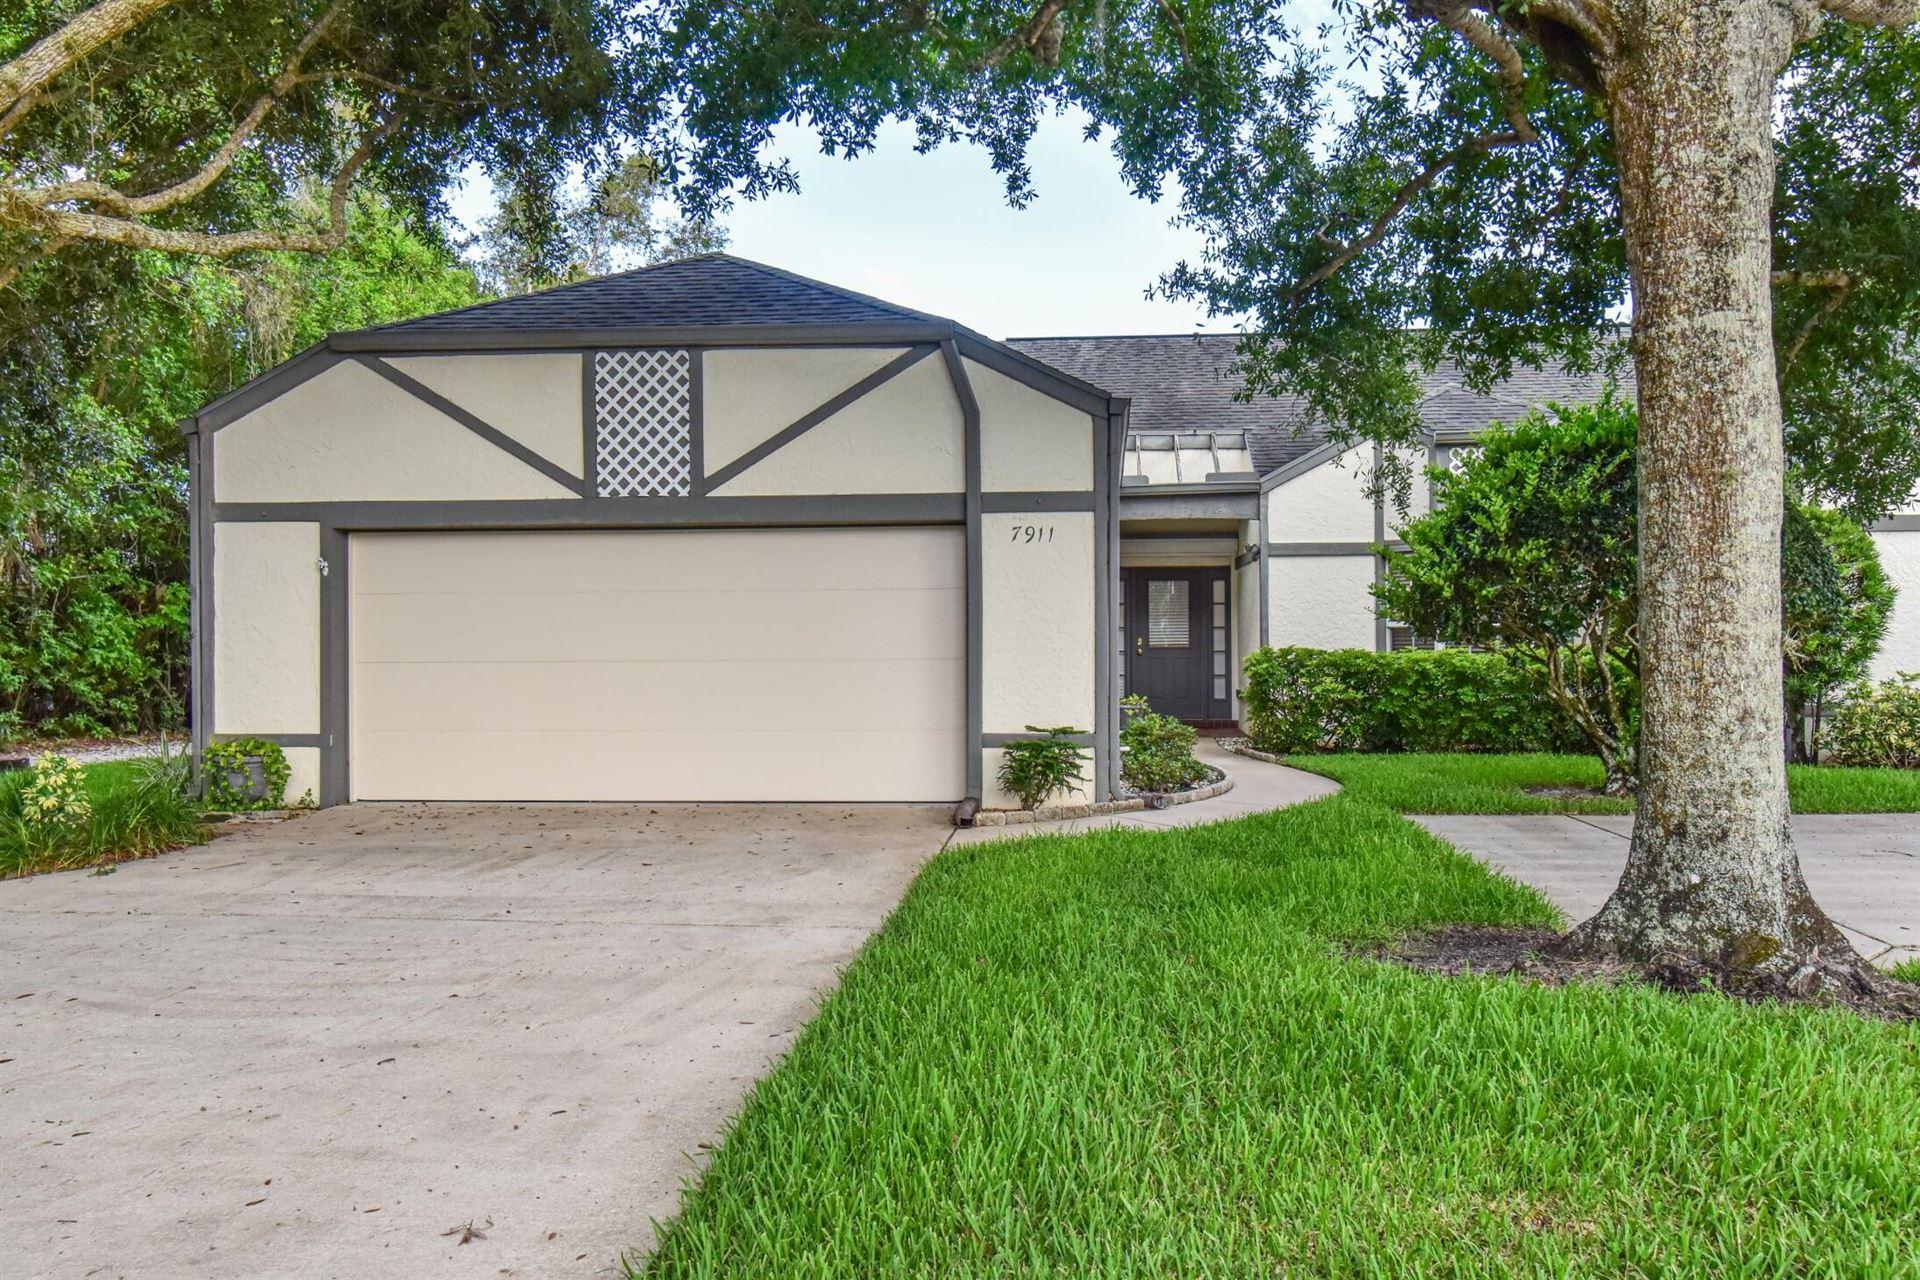 7911 Cambridge Manor, Vero Beach, FL 32966 - #: RX-10638146